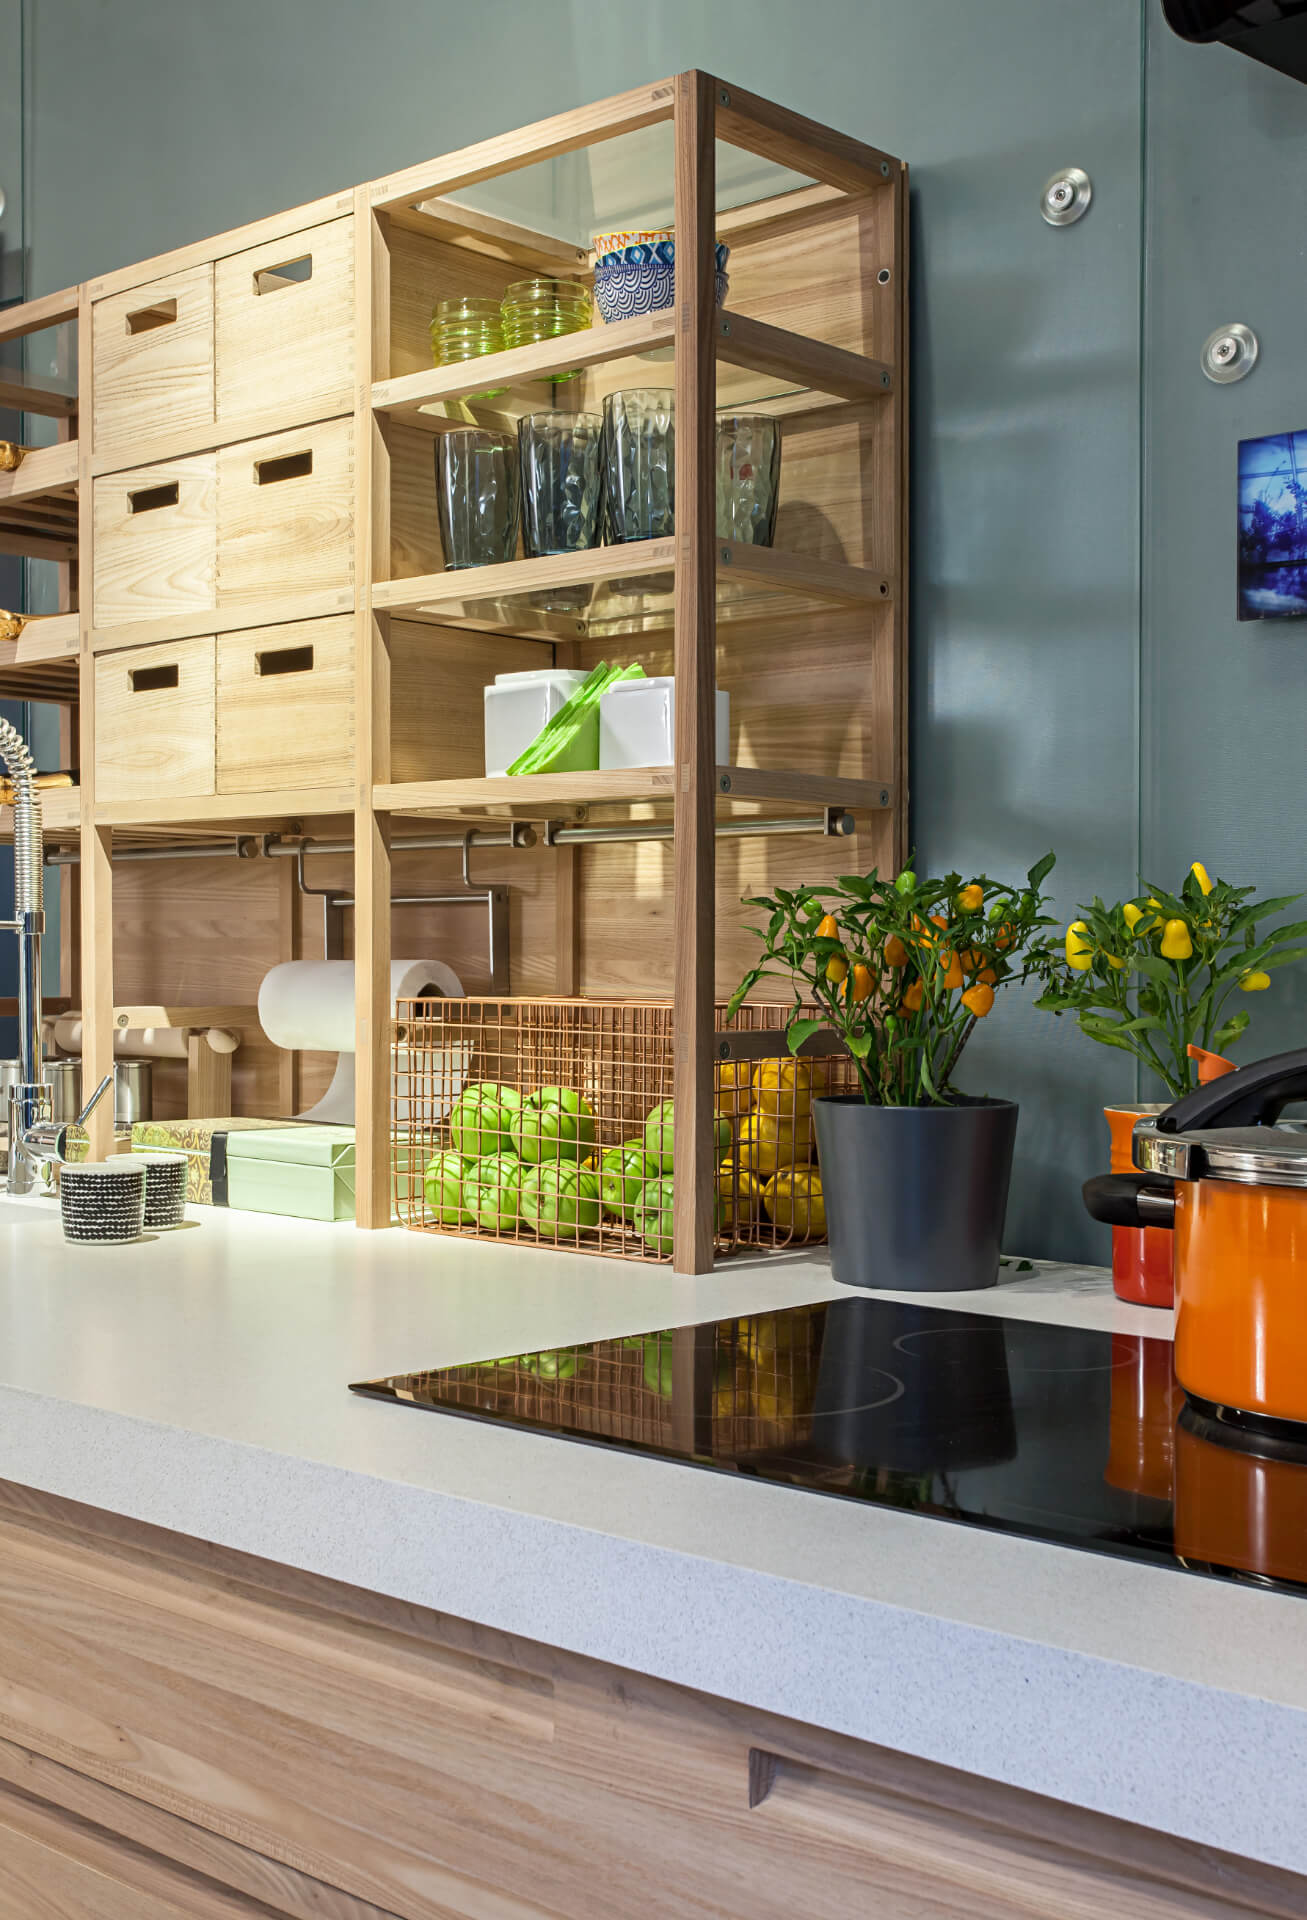 Cosentino Silestone Wooden Kitchen